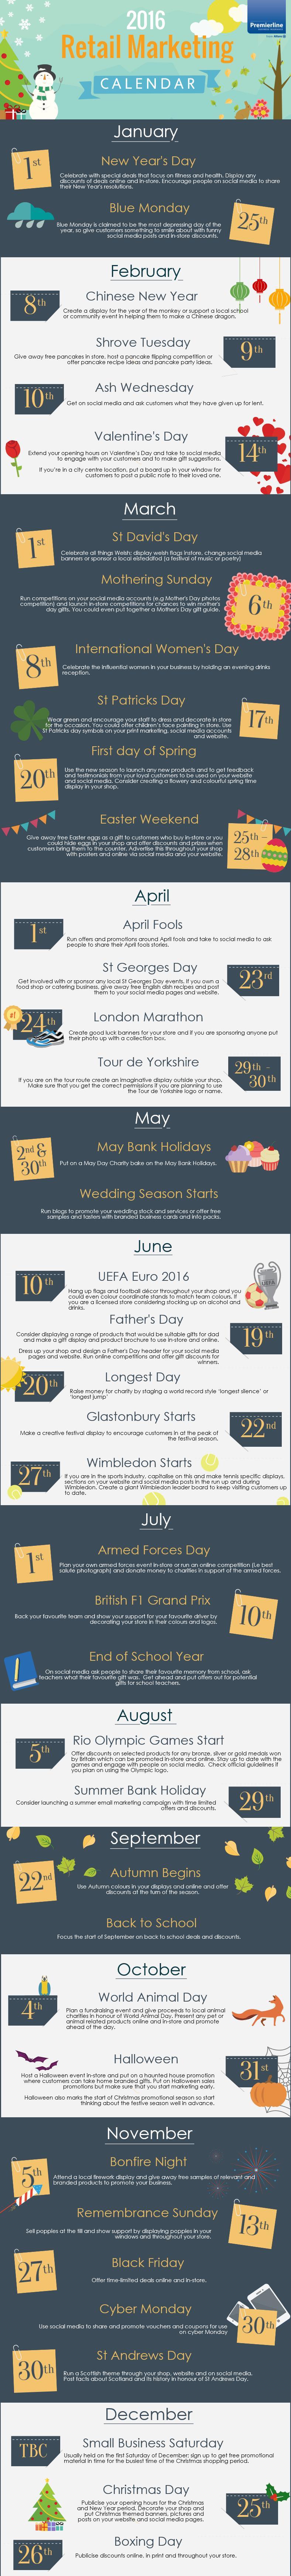 2016 retail calendar